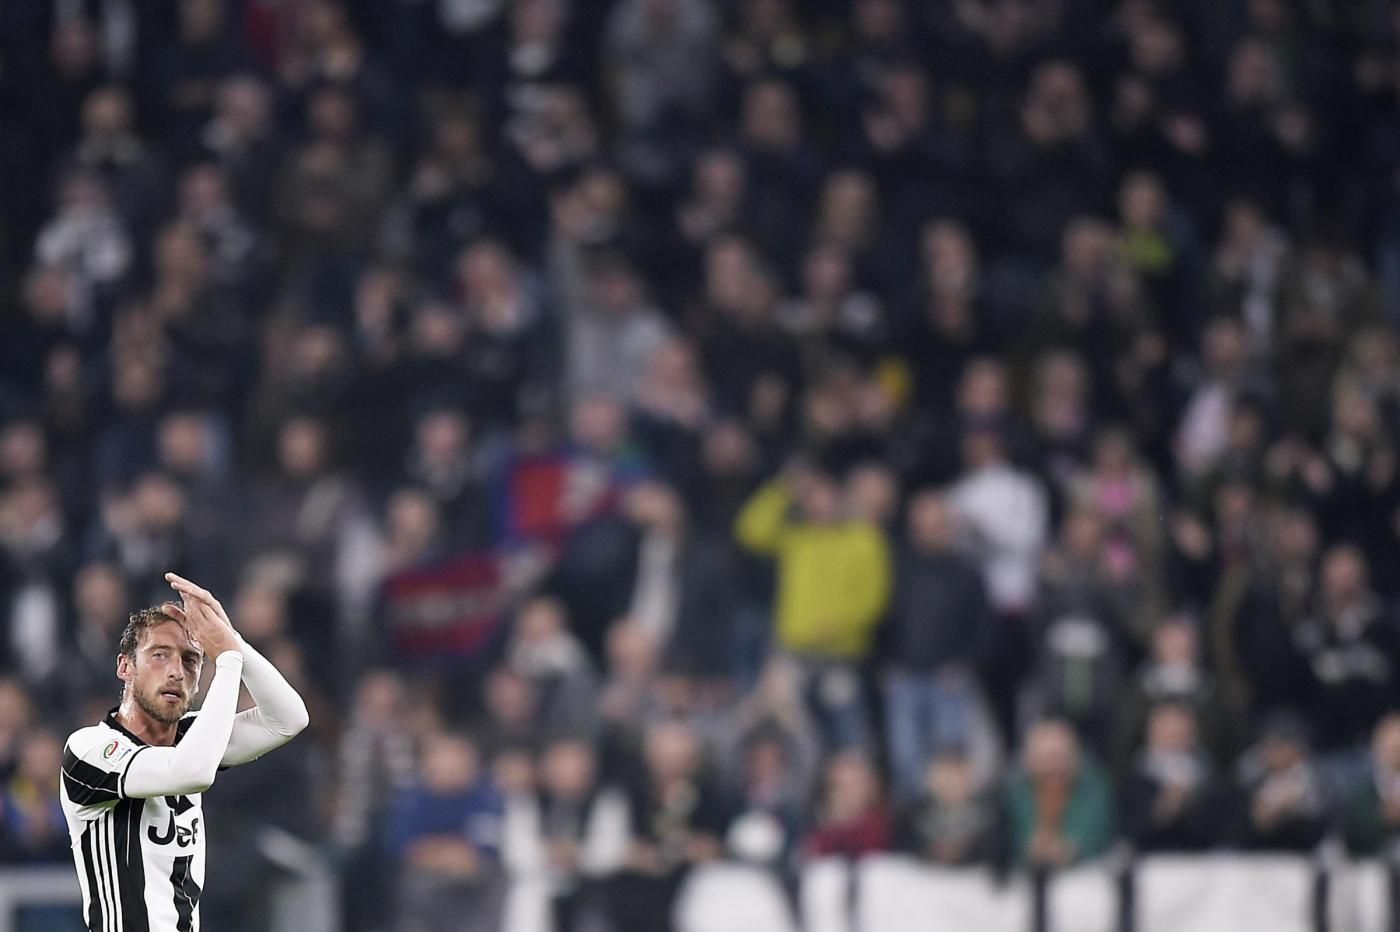 Serie A, Juve - Samp 4 - Sportmediaset - Foto 46